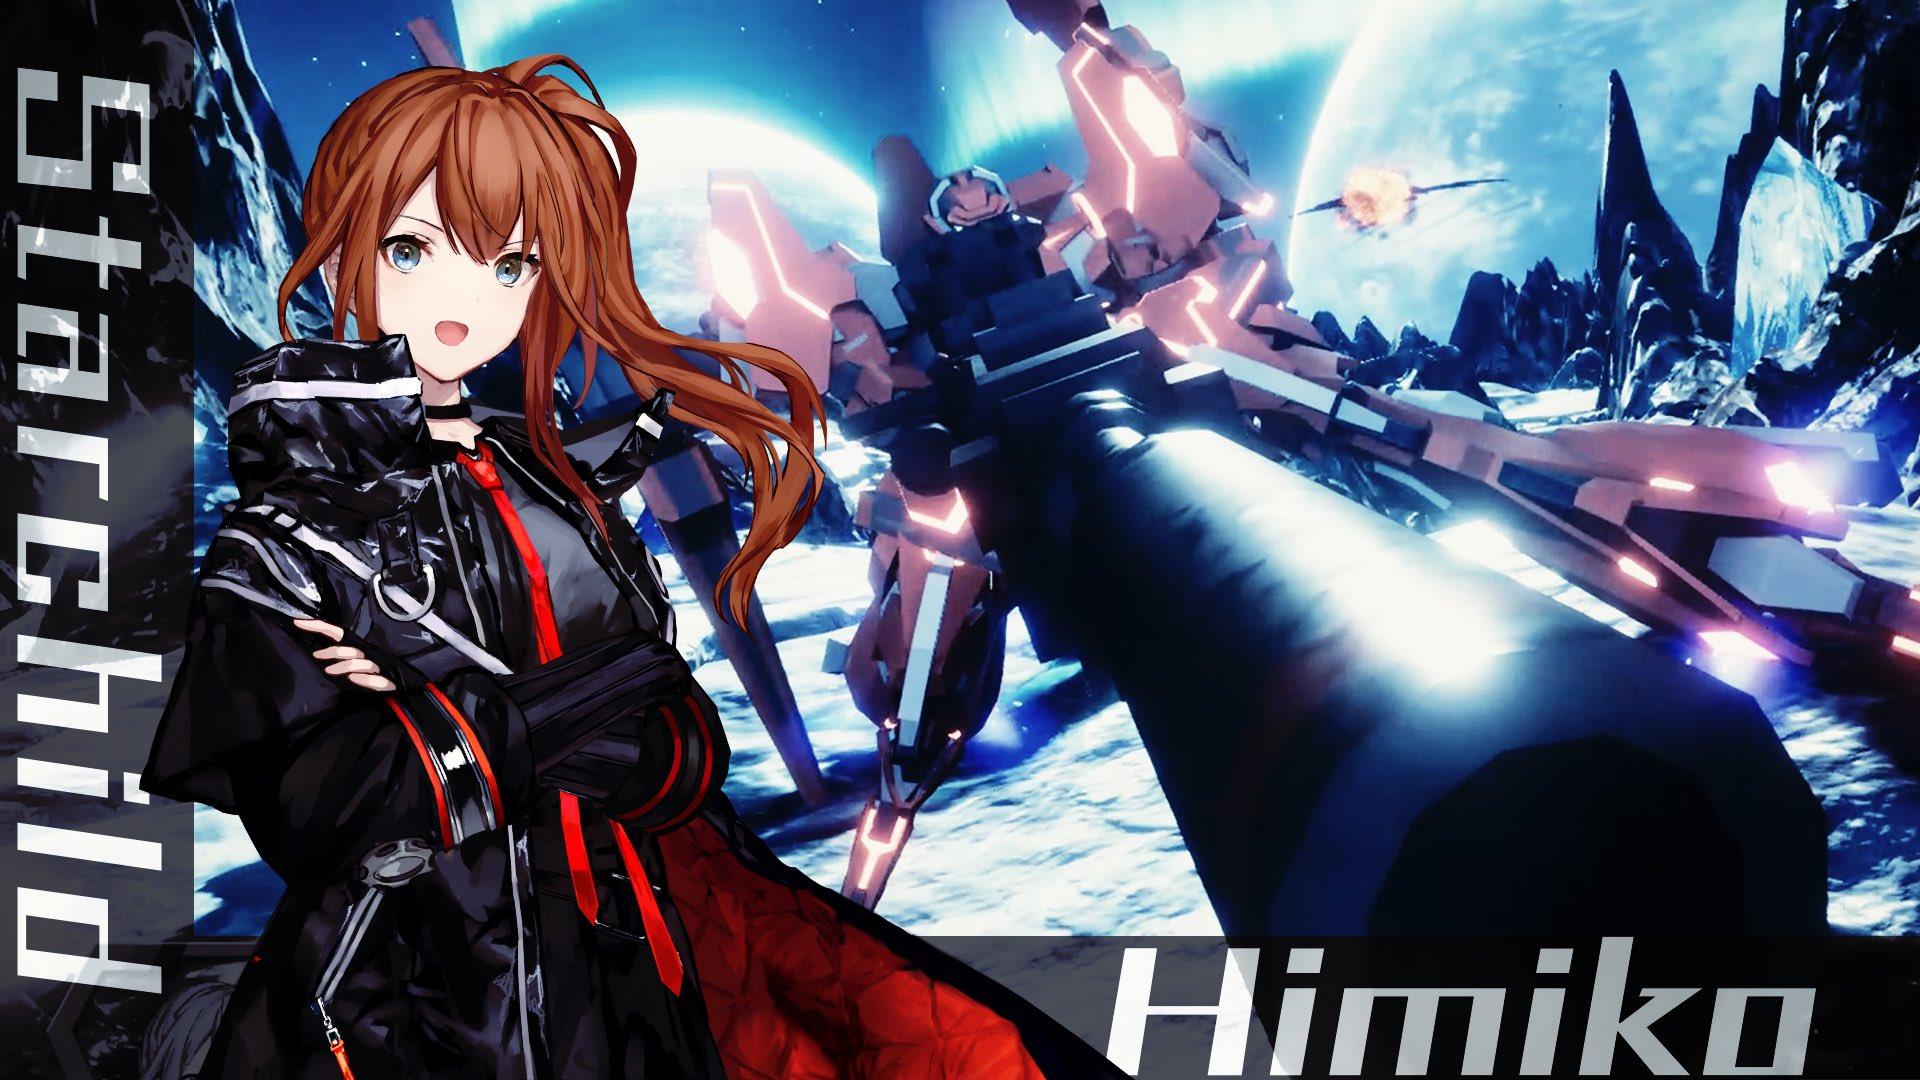 Relayer Himiko